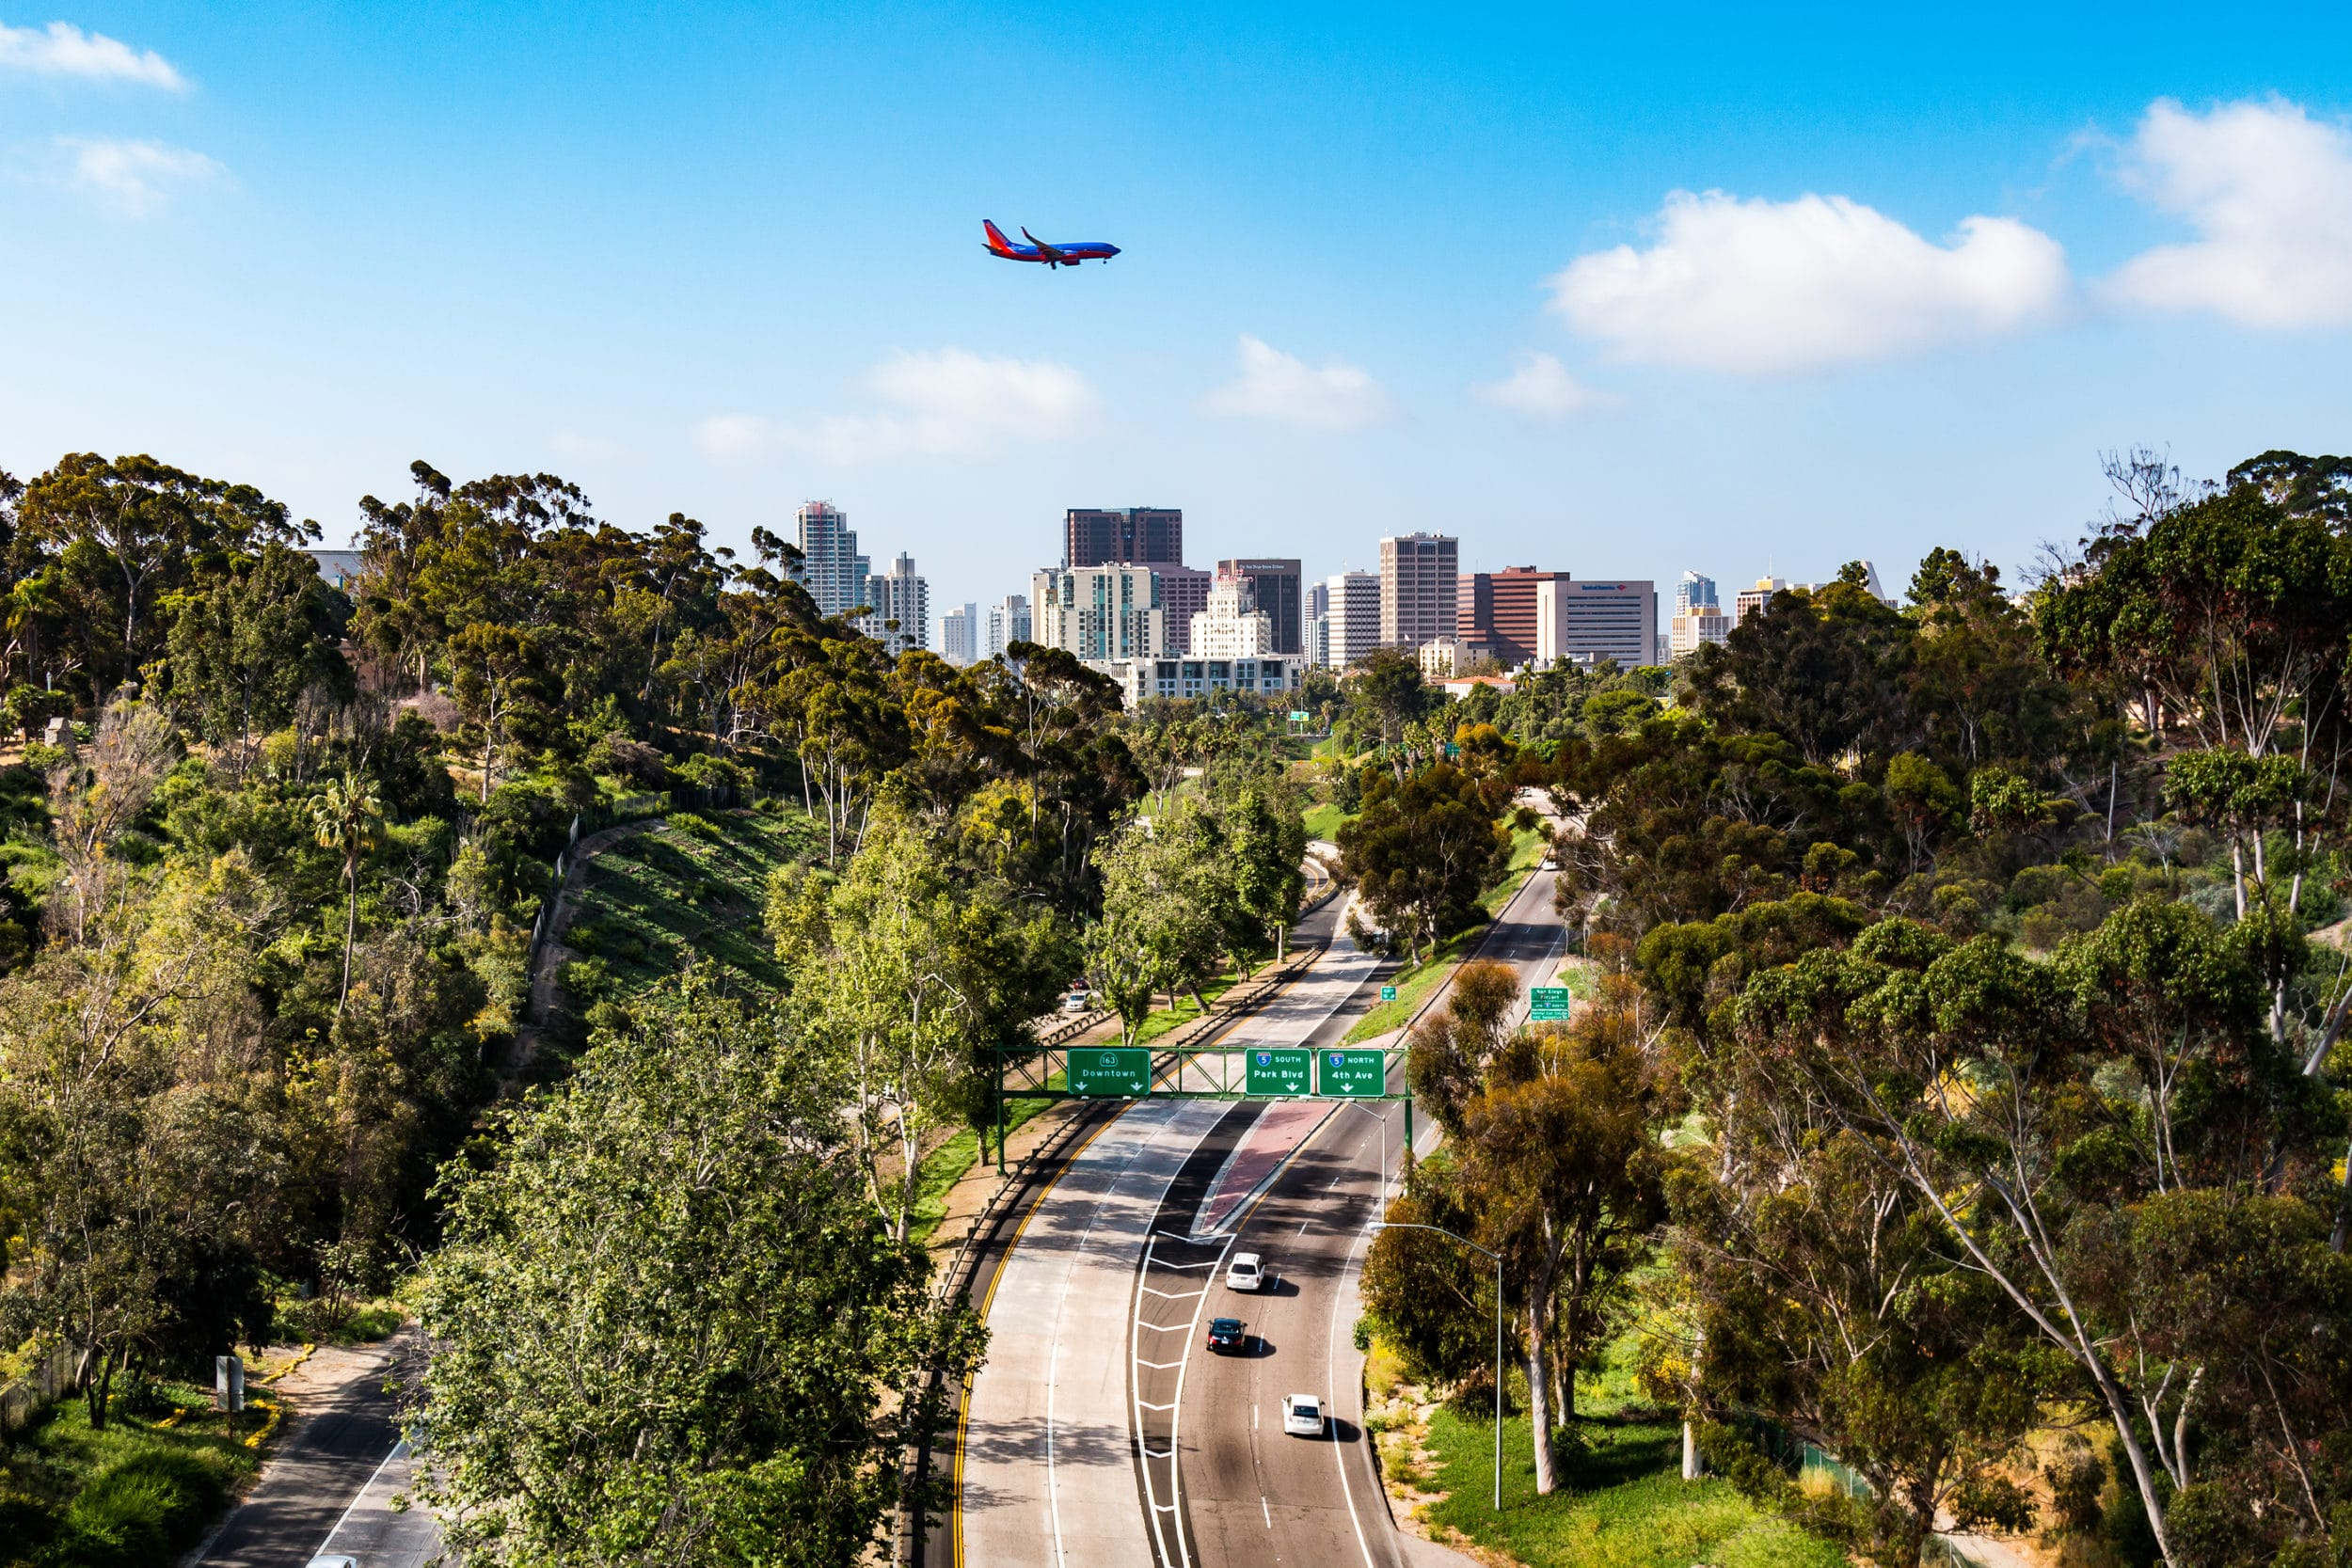 Getting Around San Diego: Do You Need a Car Rental? - La